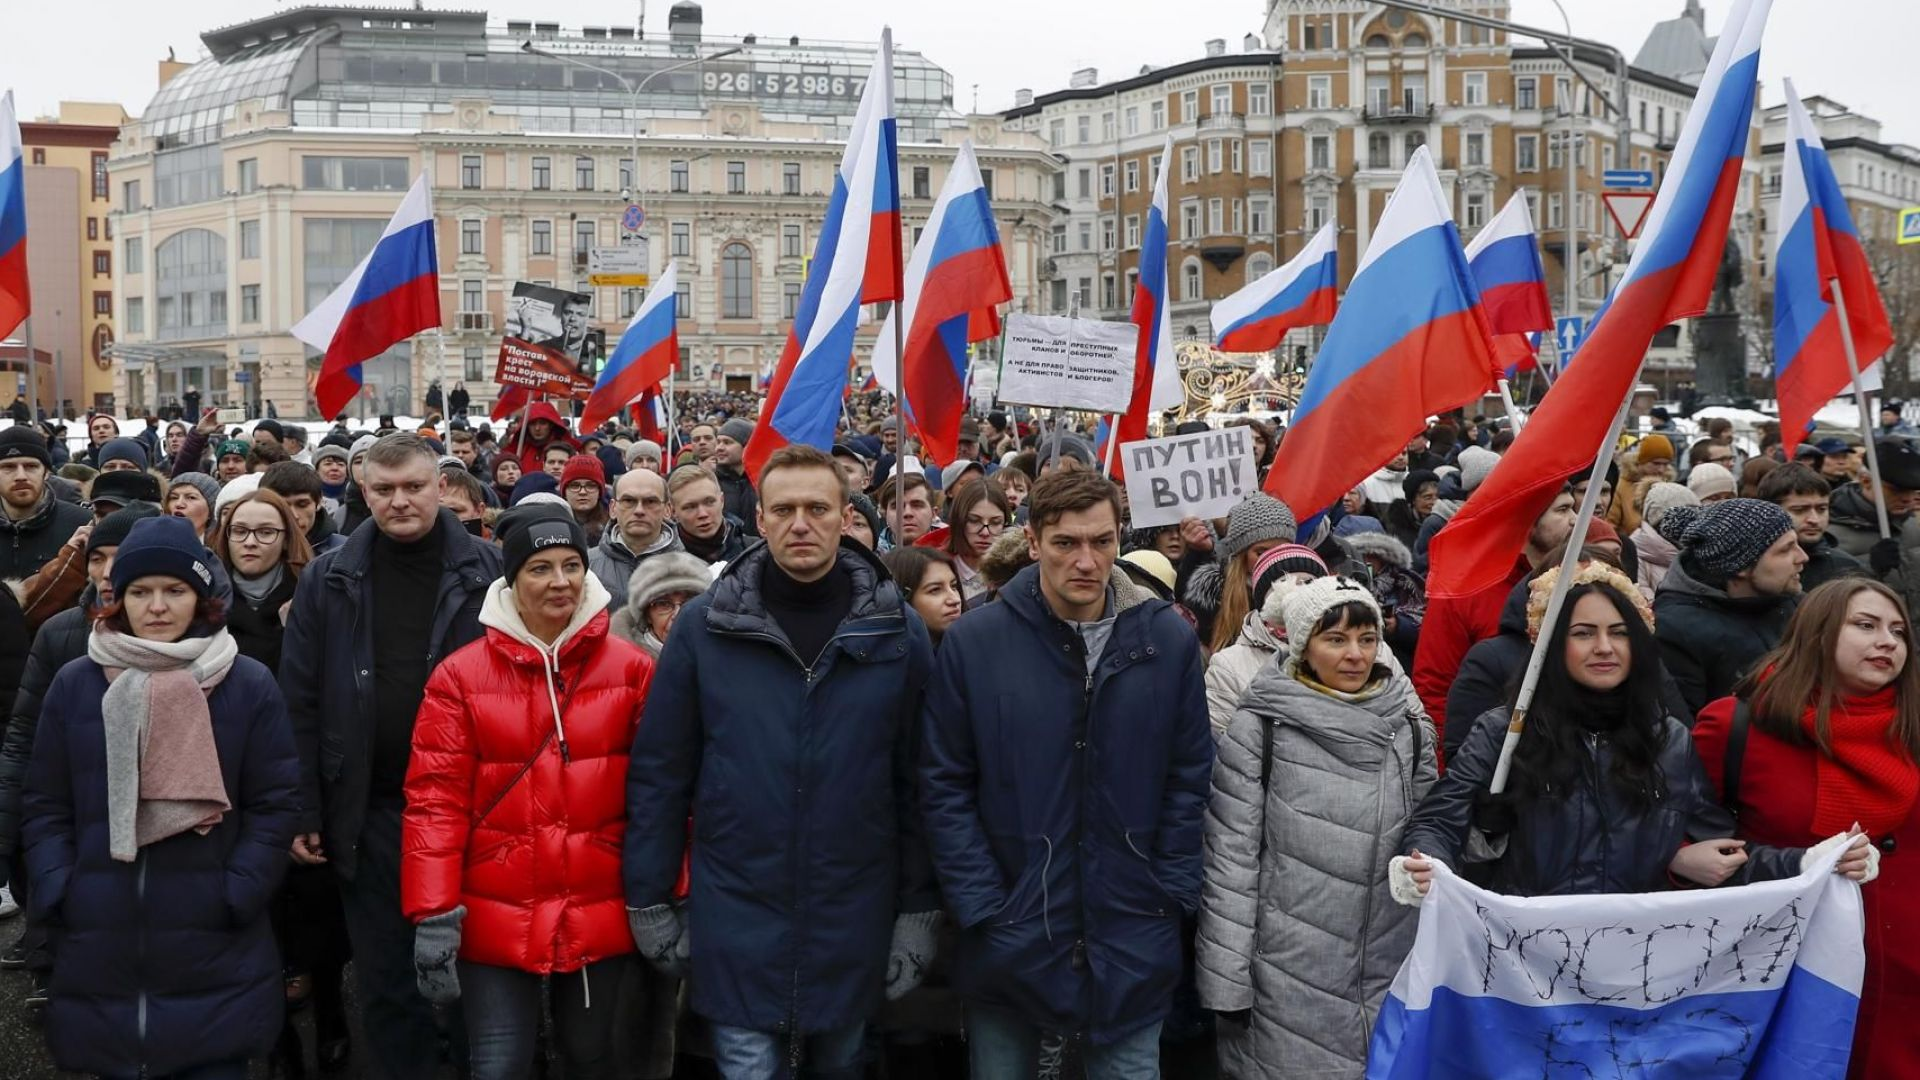 Над 10 000 души участват в паметен марш в памет на убития Борис Немцов